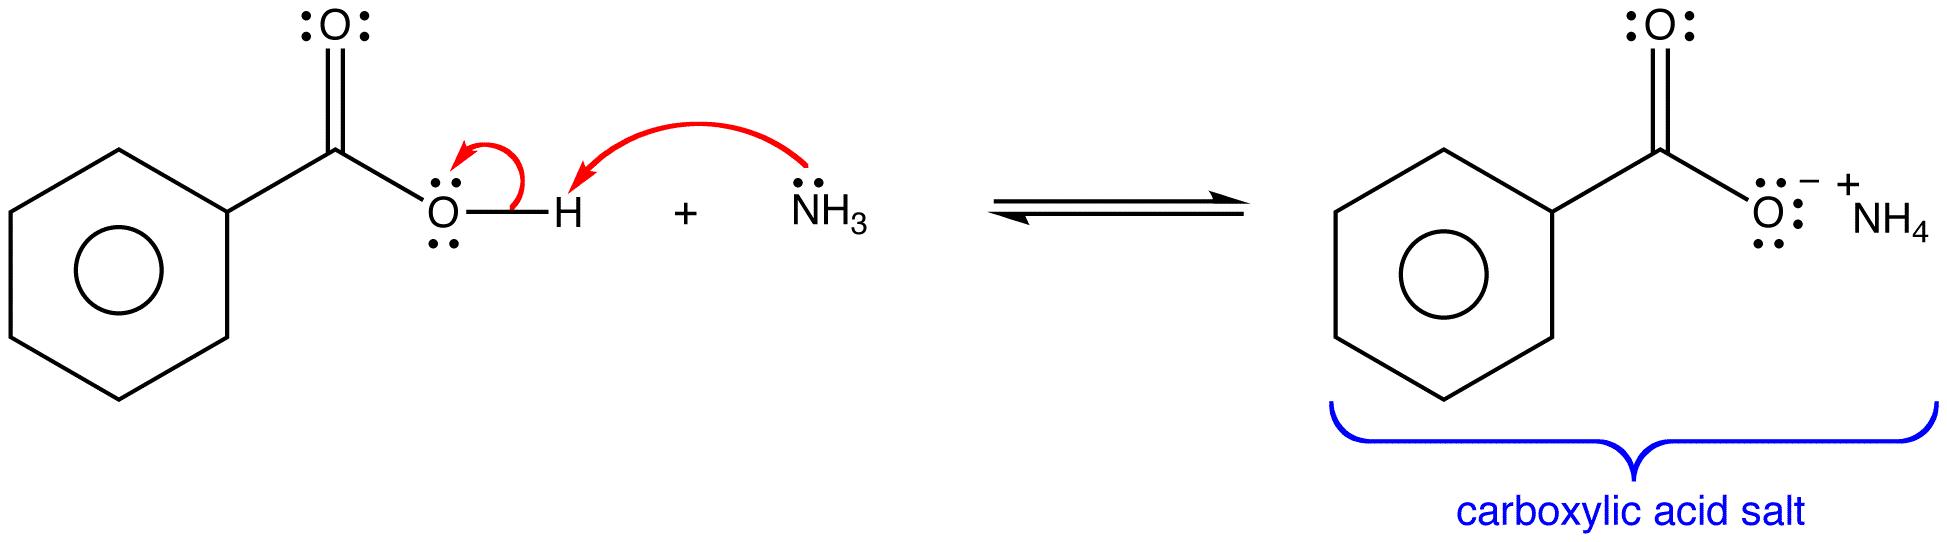 Benzene Ring And Carboxylic Acid